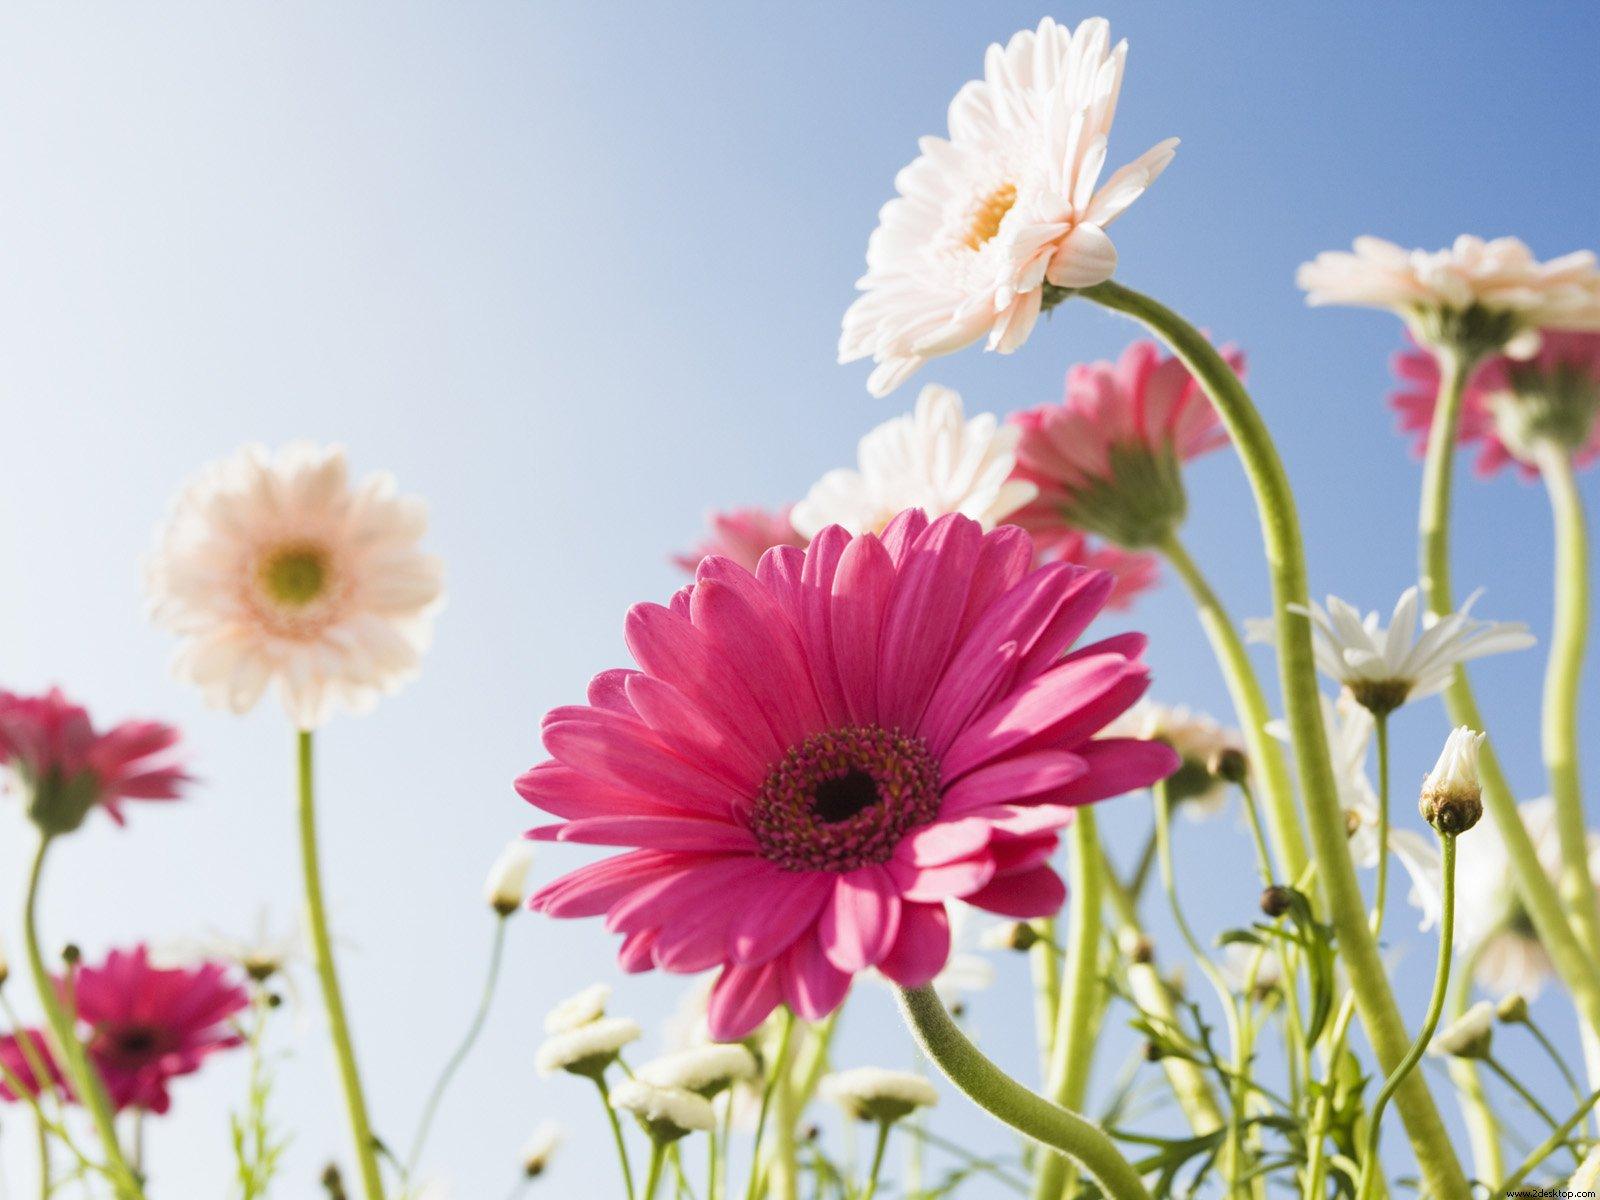 Fondos De Pantalla De Flores Hermosas Para Fondo Celular: Imagenes Para Celular Animadas Con Movimiento